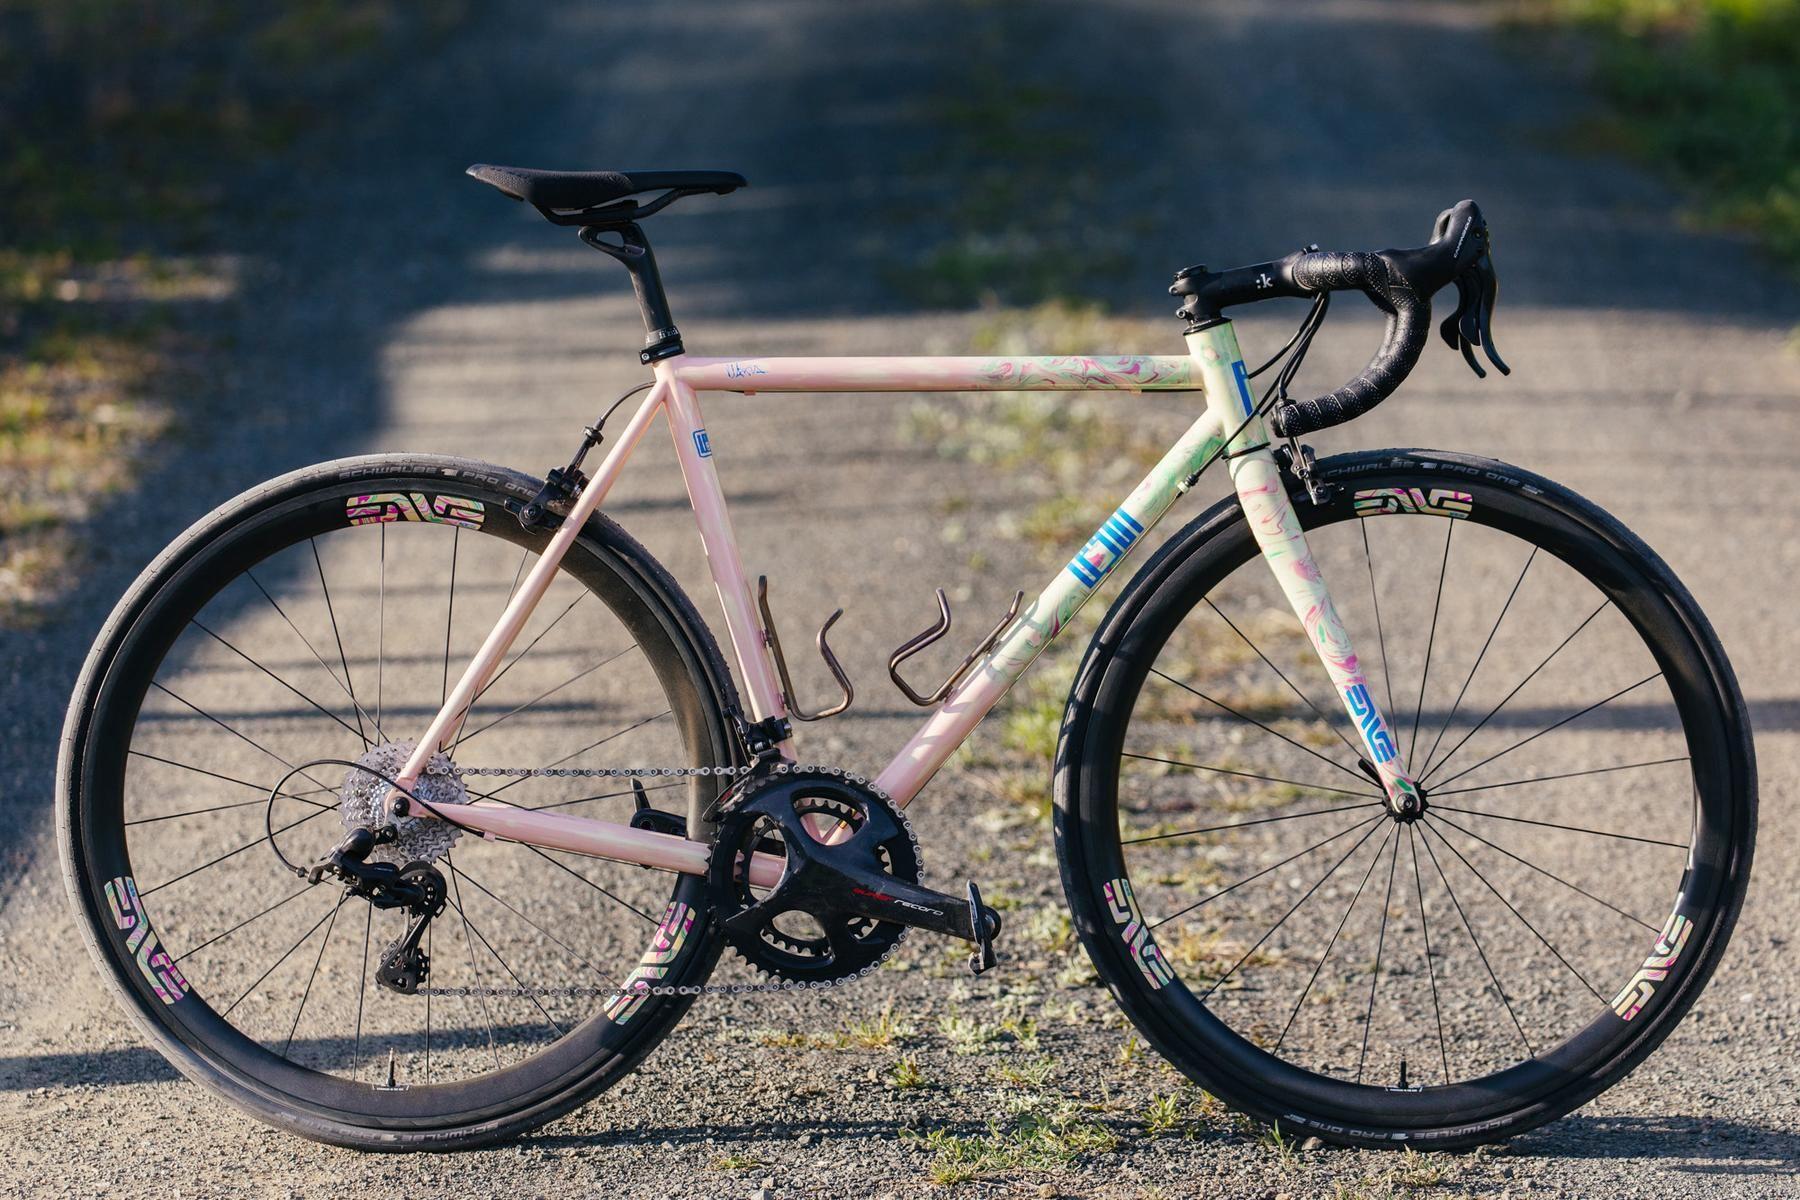 Legor Cicli in California: Tie Dye Road with Campagnolo